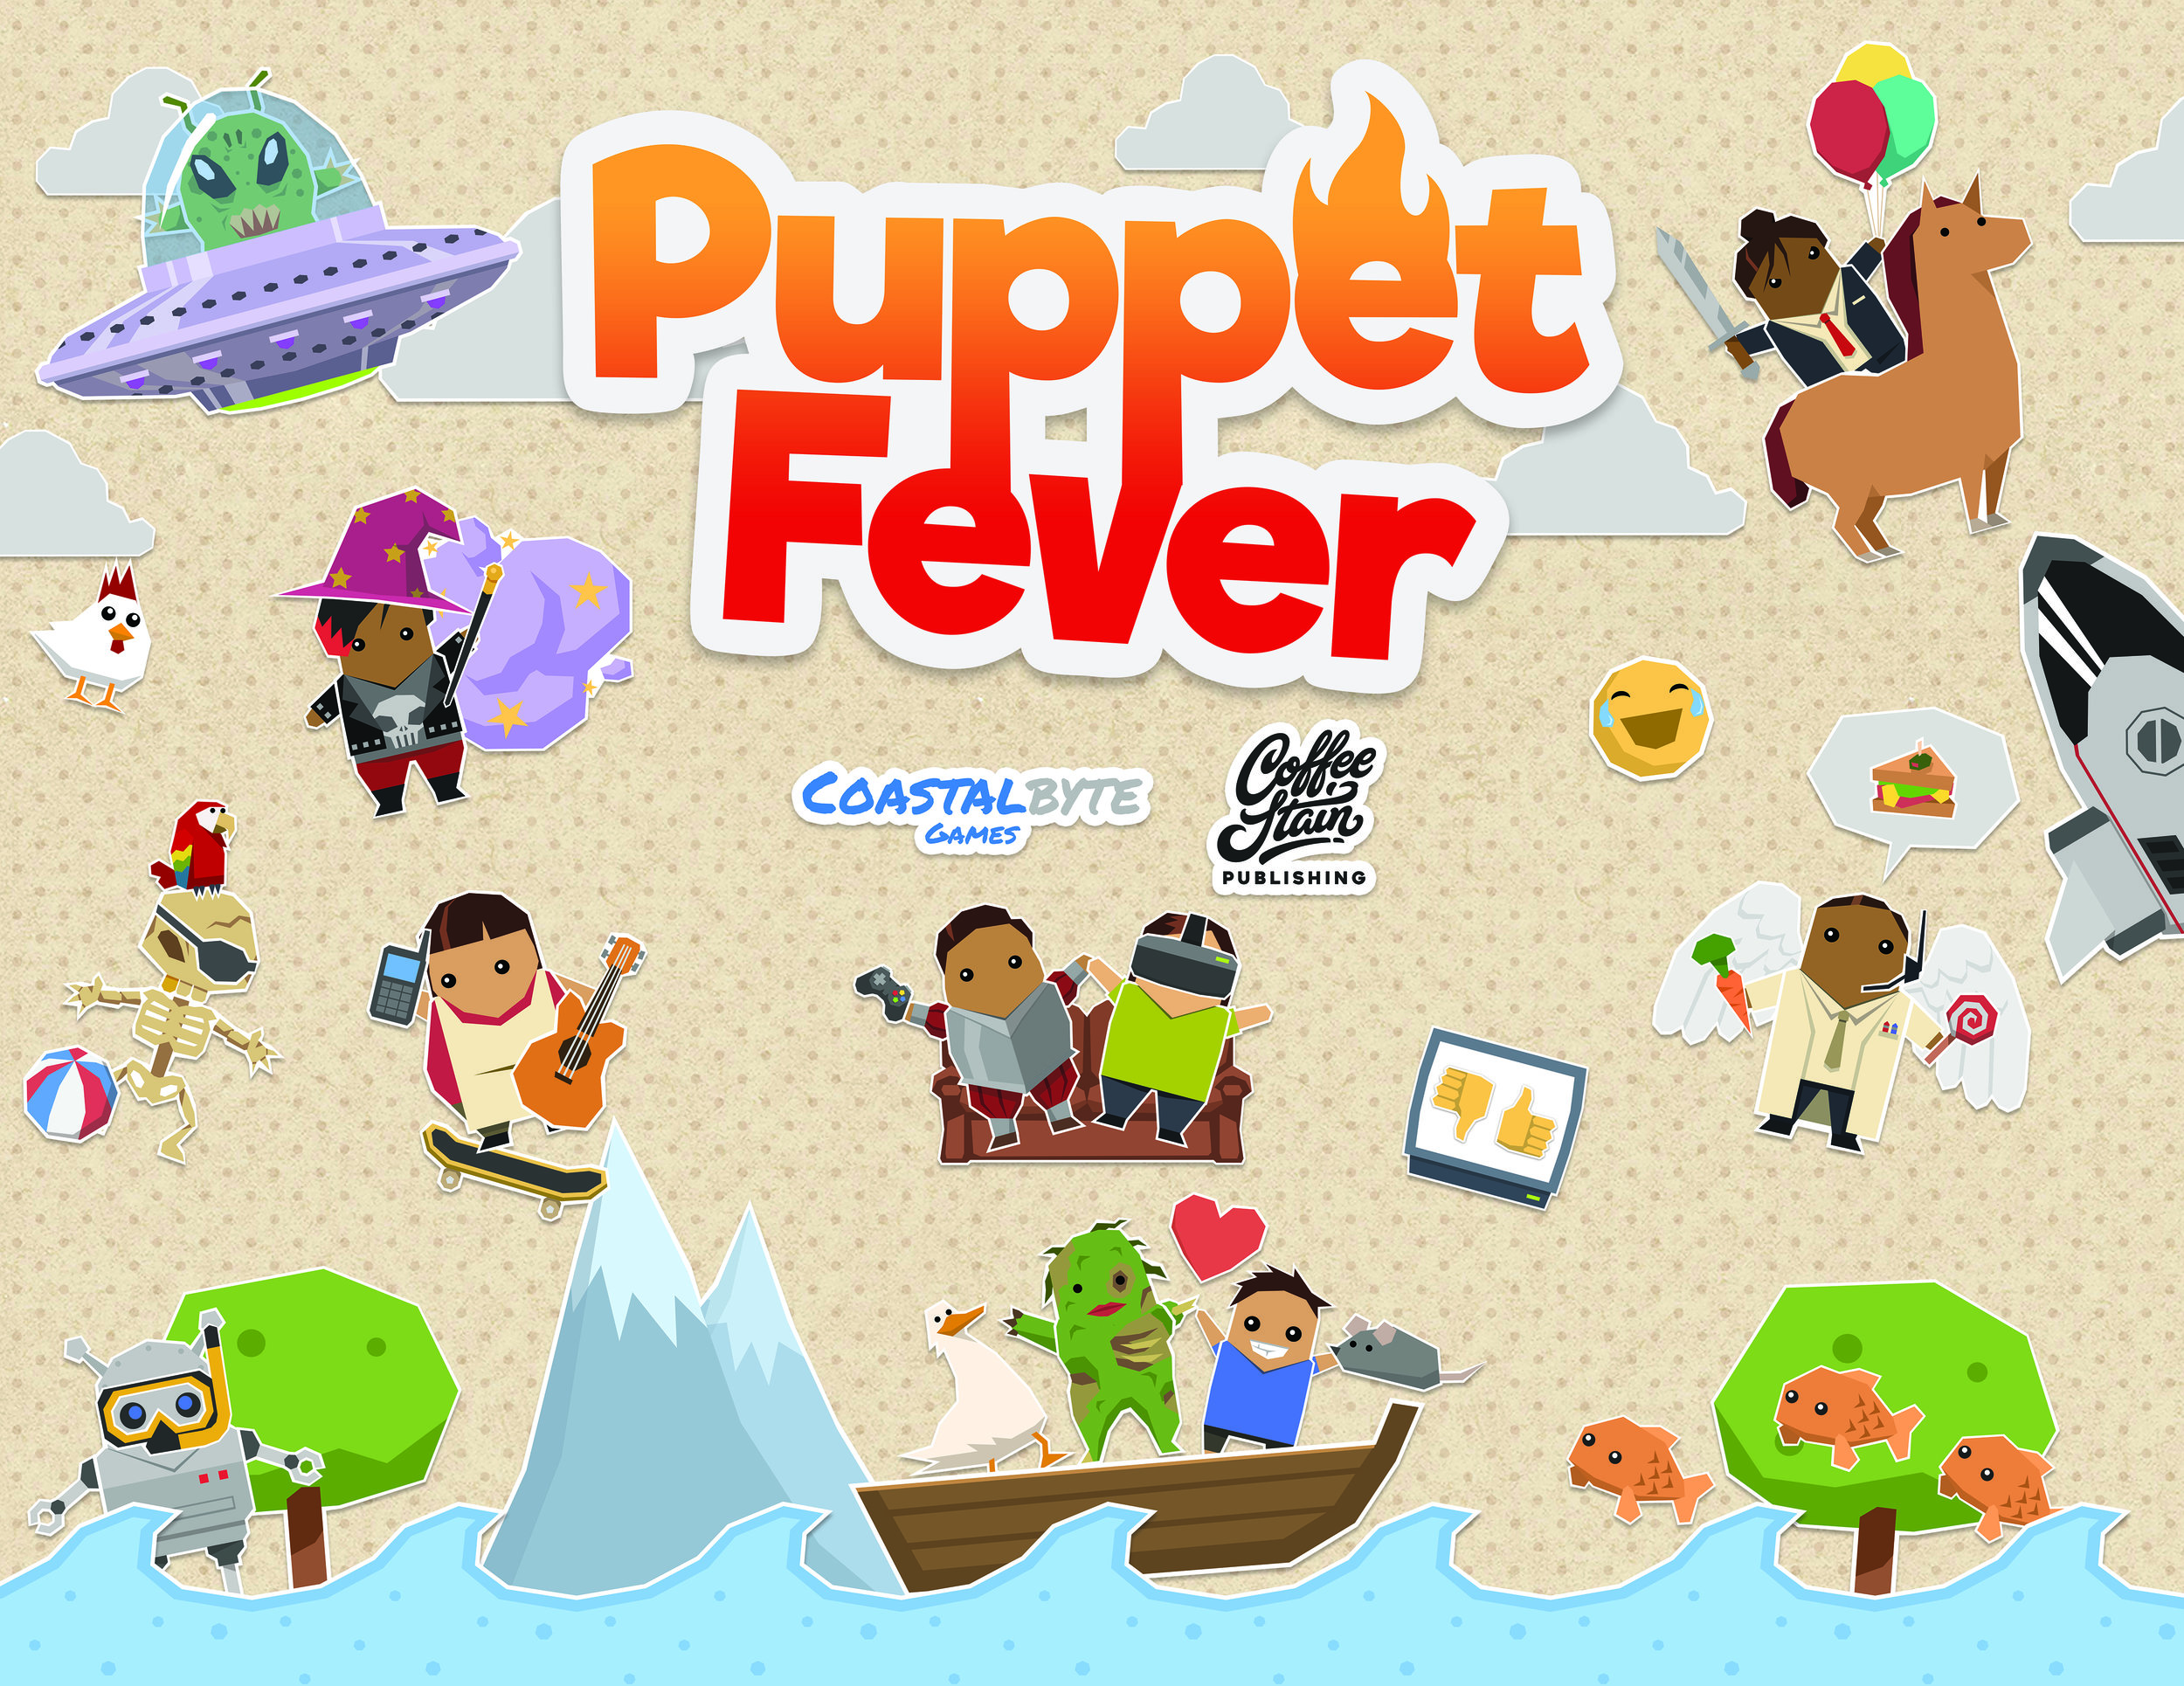 Pupper fever - Wall Poster_mindre.jpg